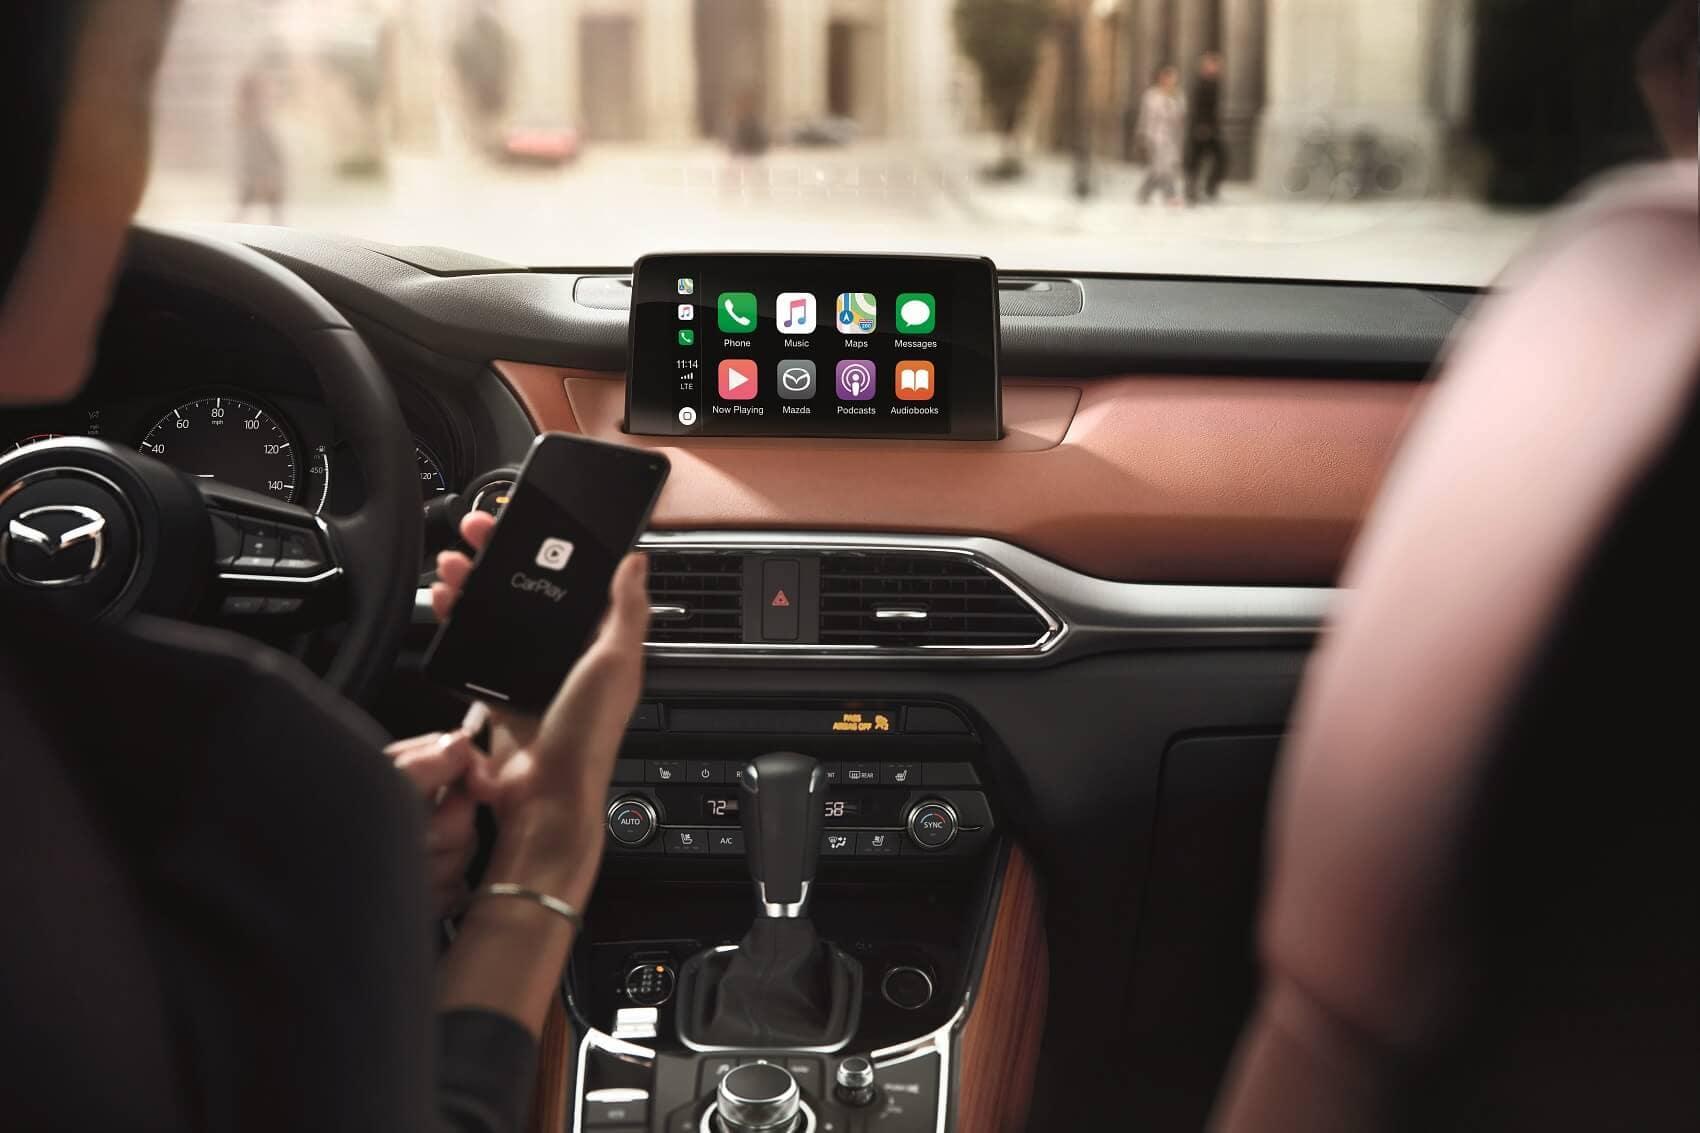 Mazda CX-9 Apple Car Play Integration